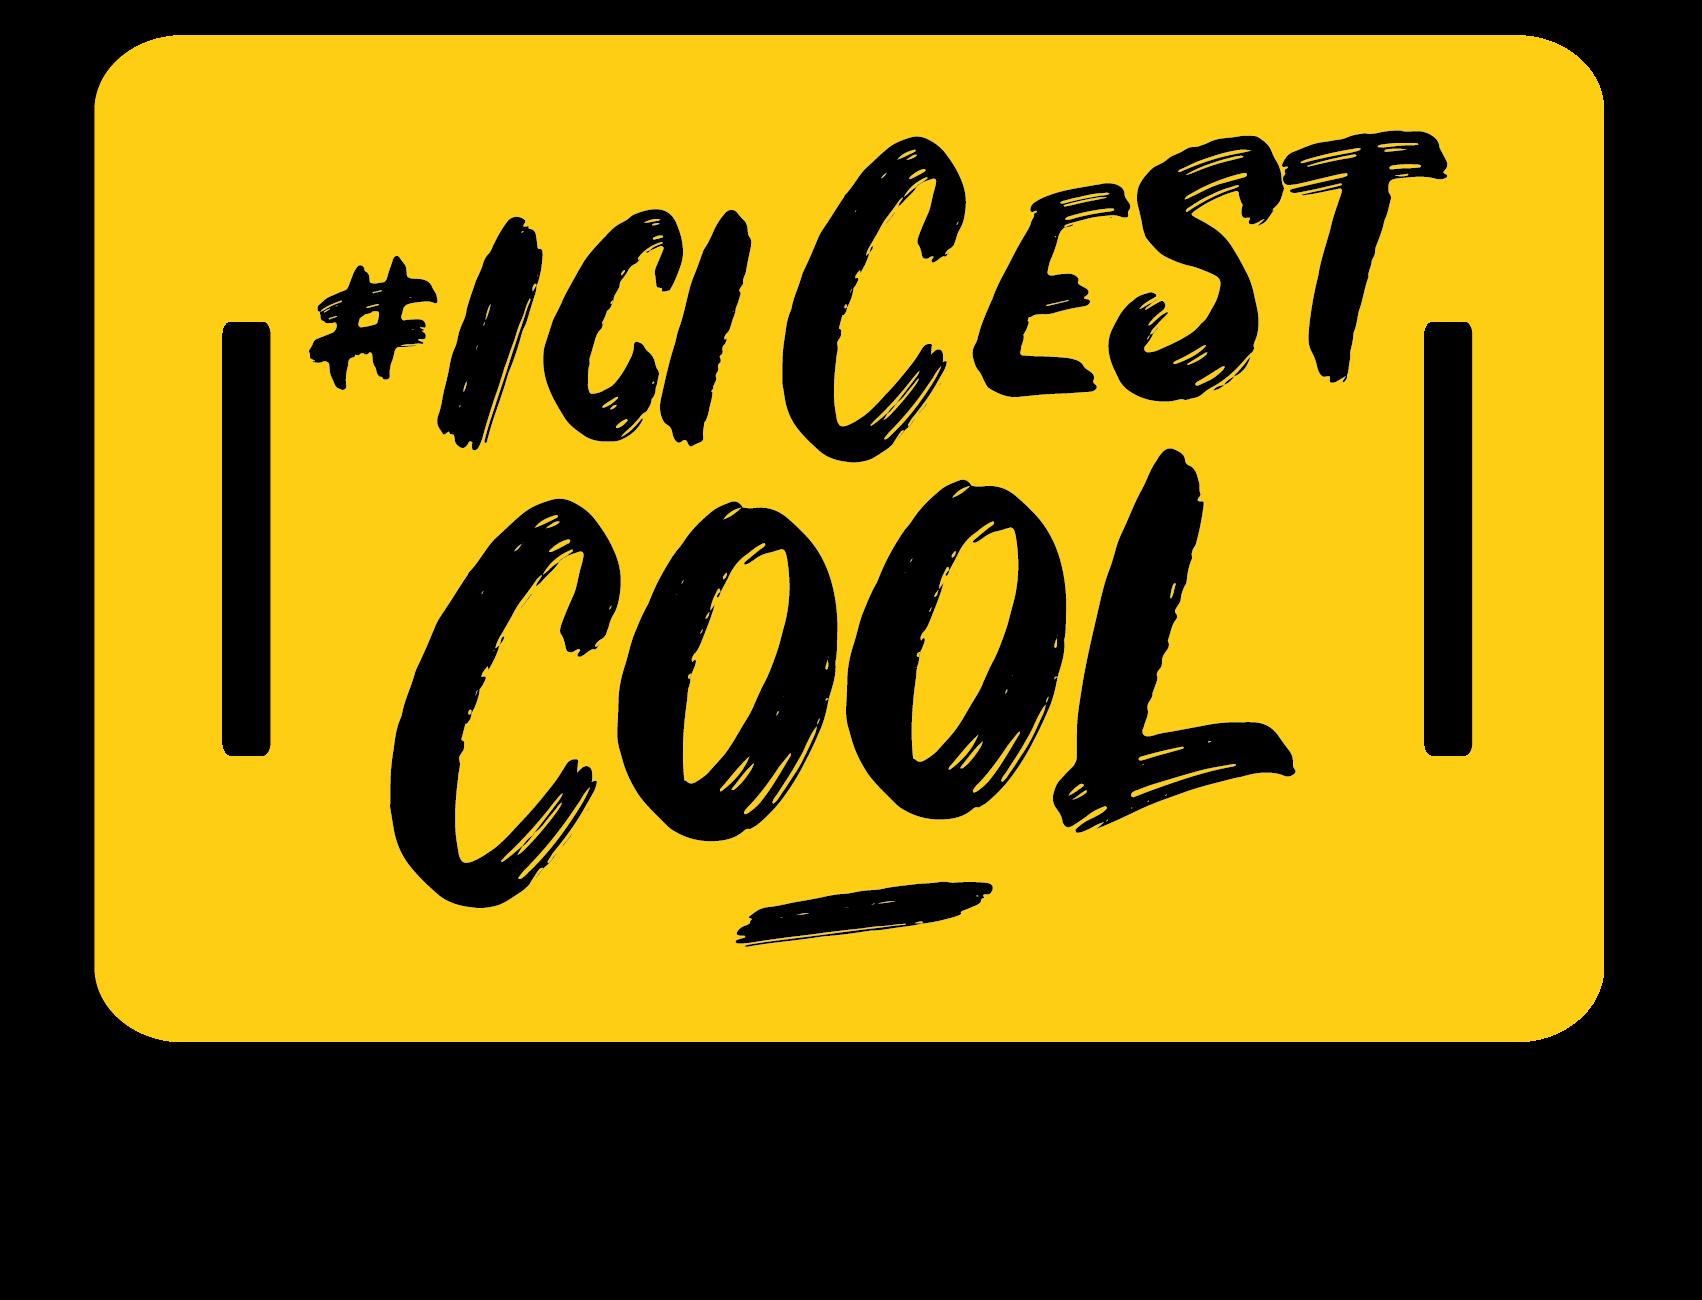 #IciCestCool